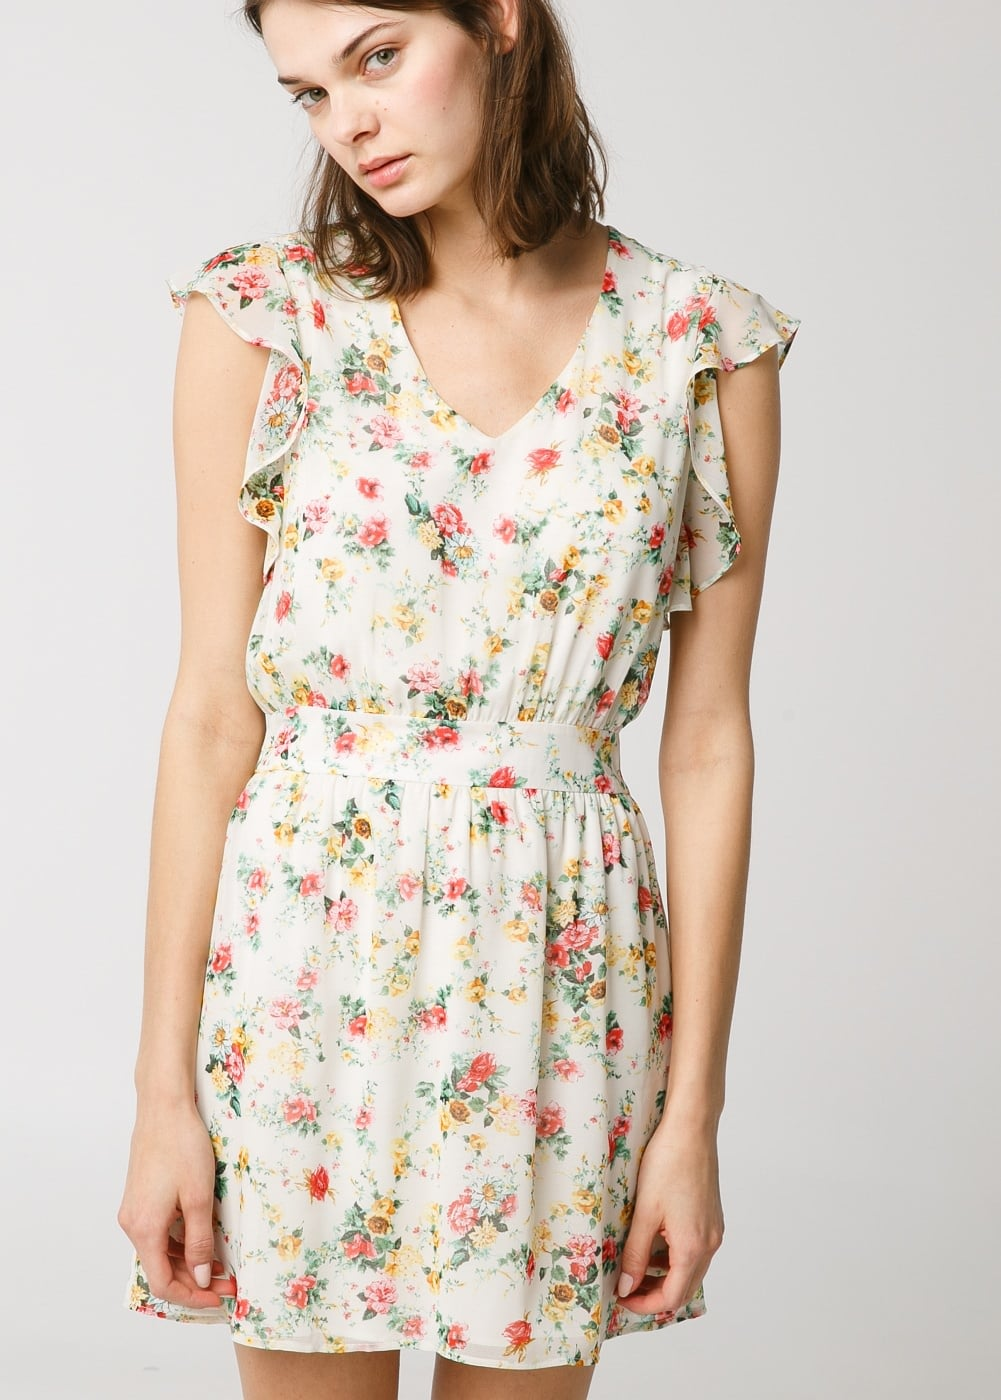 Mango Floral Chiffon Dress ($35, originally $60)